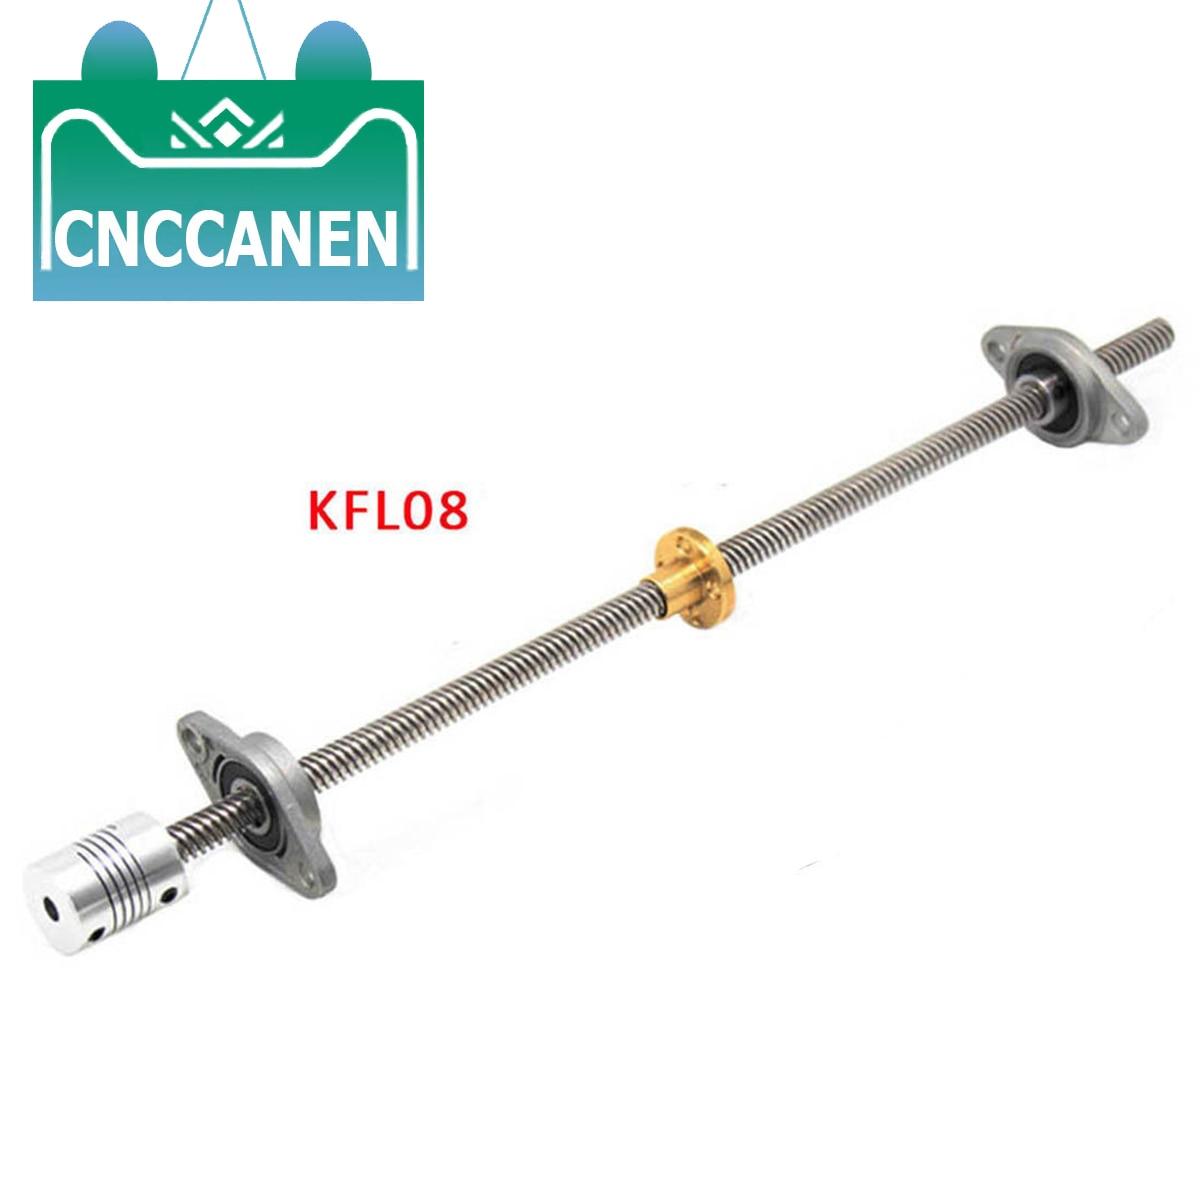 1Pcs T8 Pitch 2mm Lead 8mm Lead Screw 100mm~1200 Mm  + 2Pcs Support KFL08 + 1Pcs Coupler